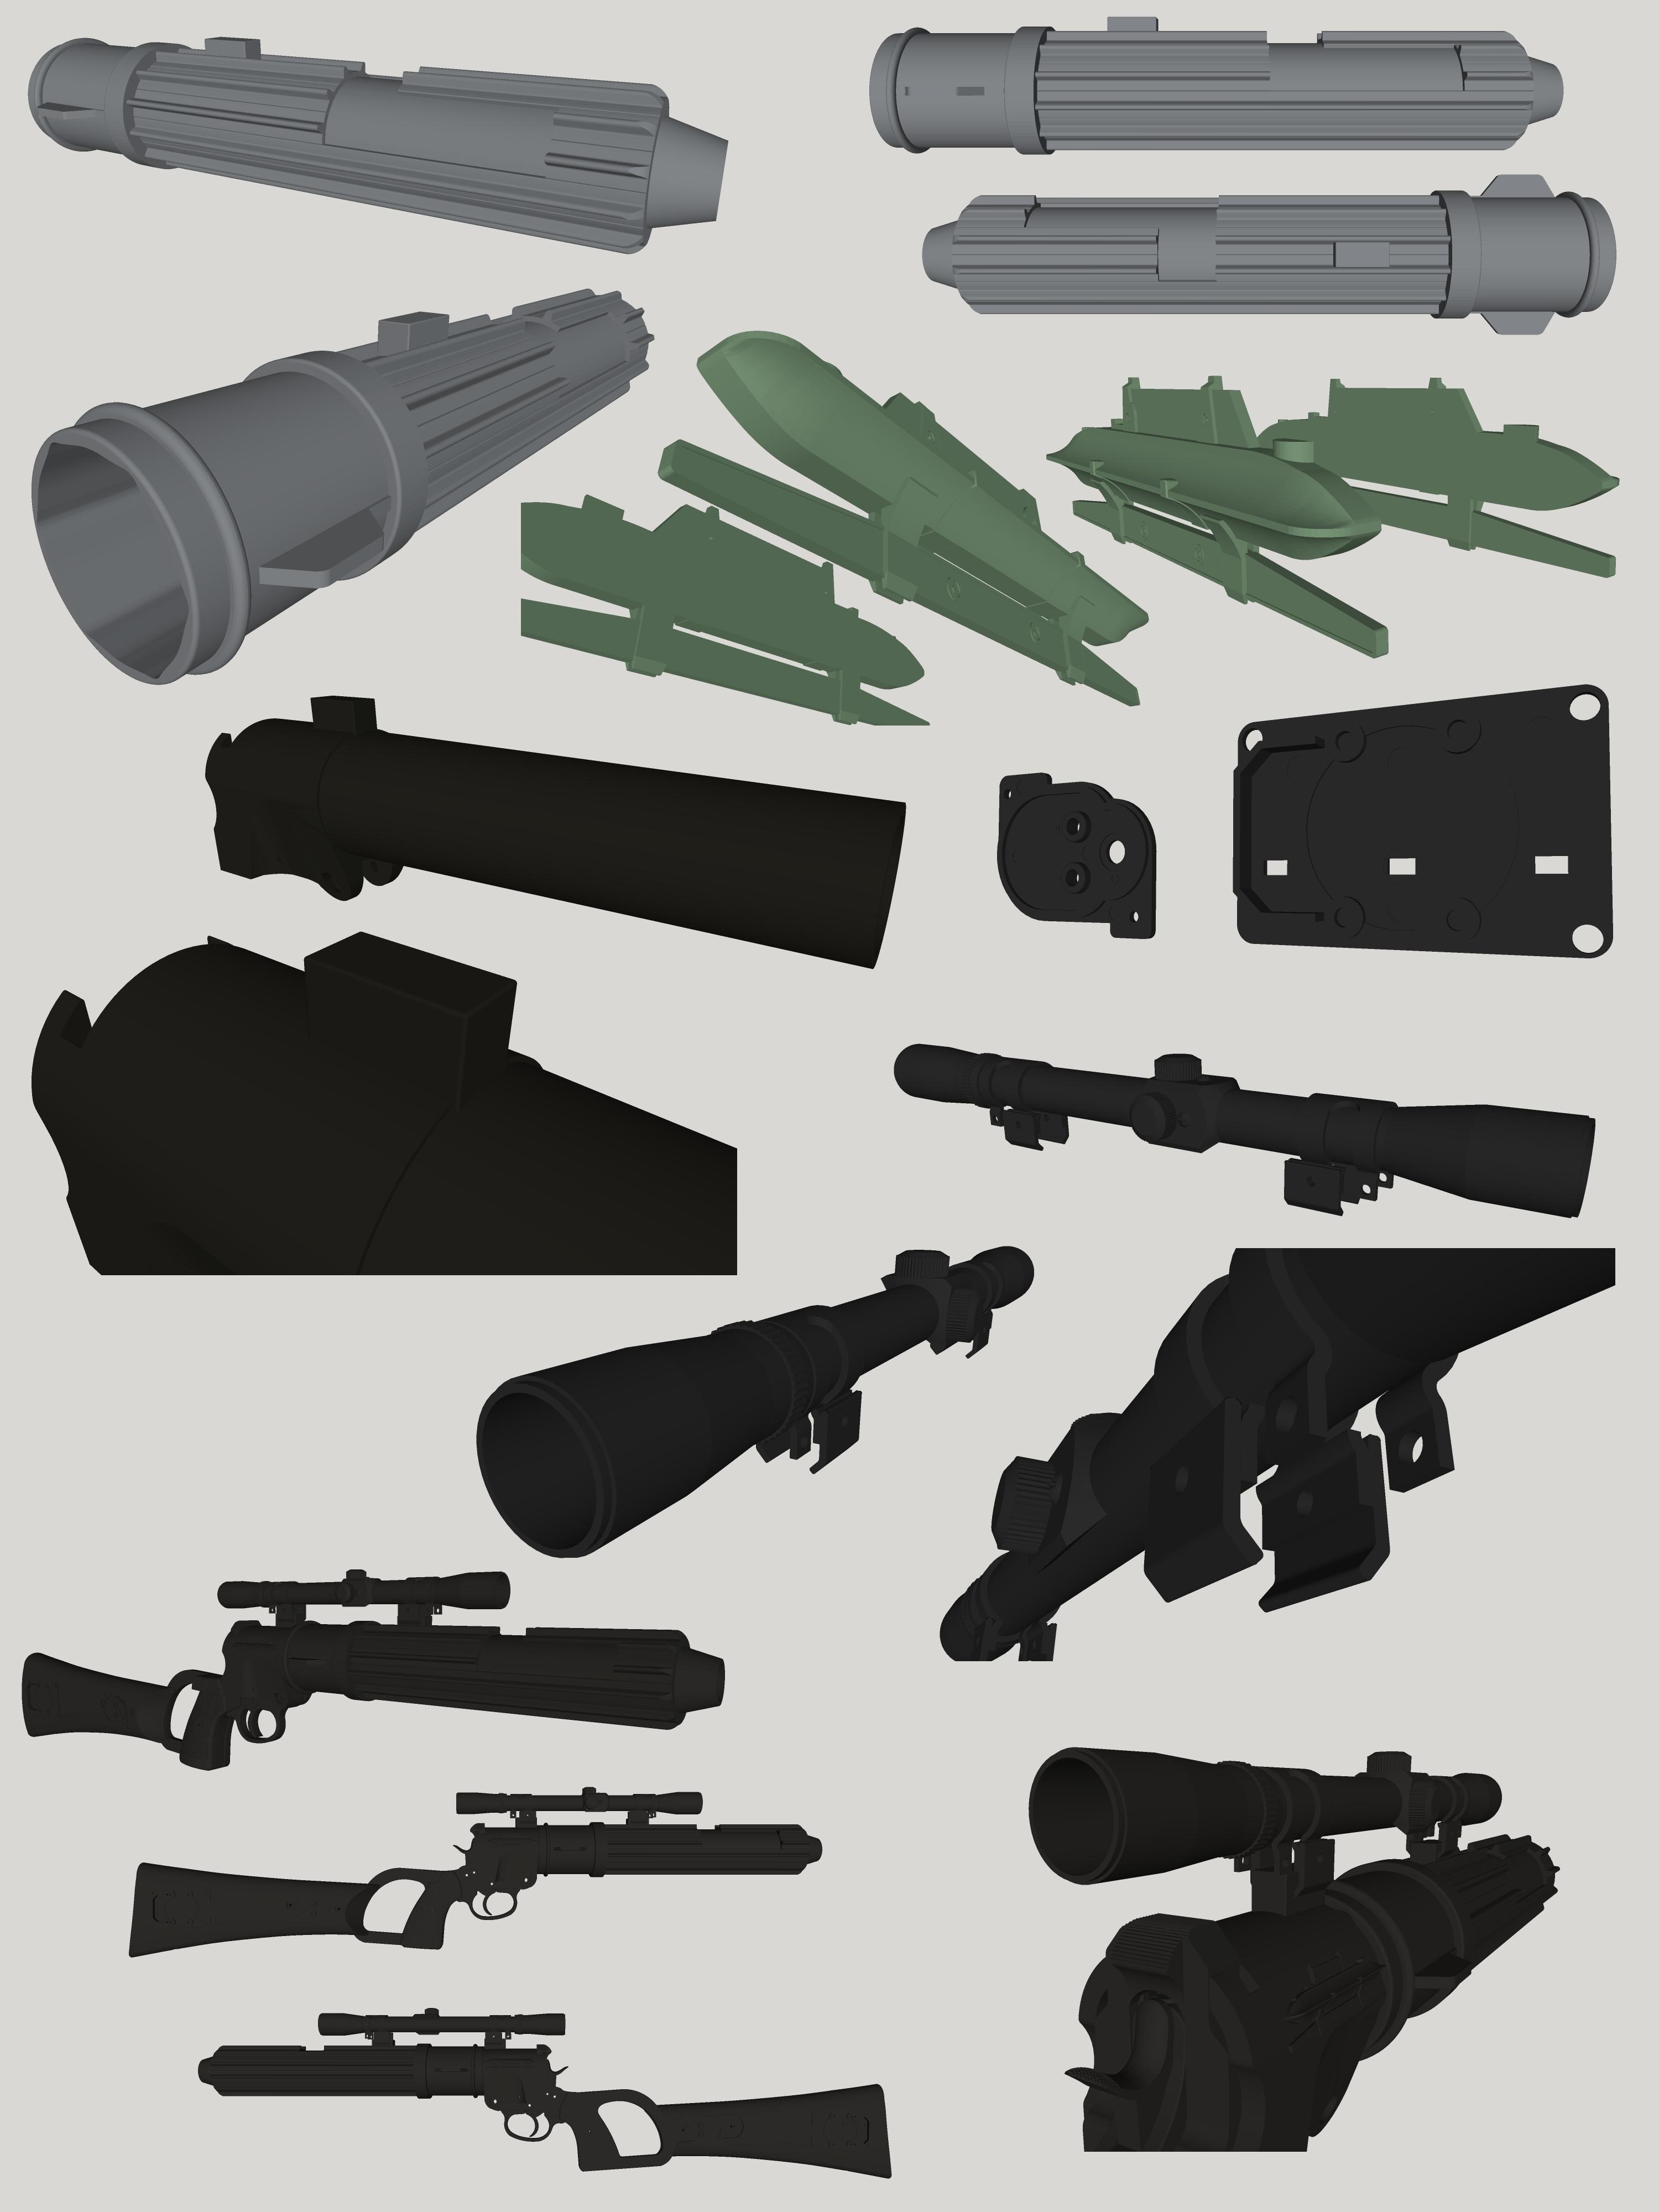 ROTJ EE-3 Blaster Parts.jpg